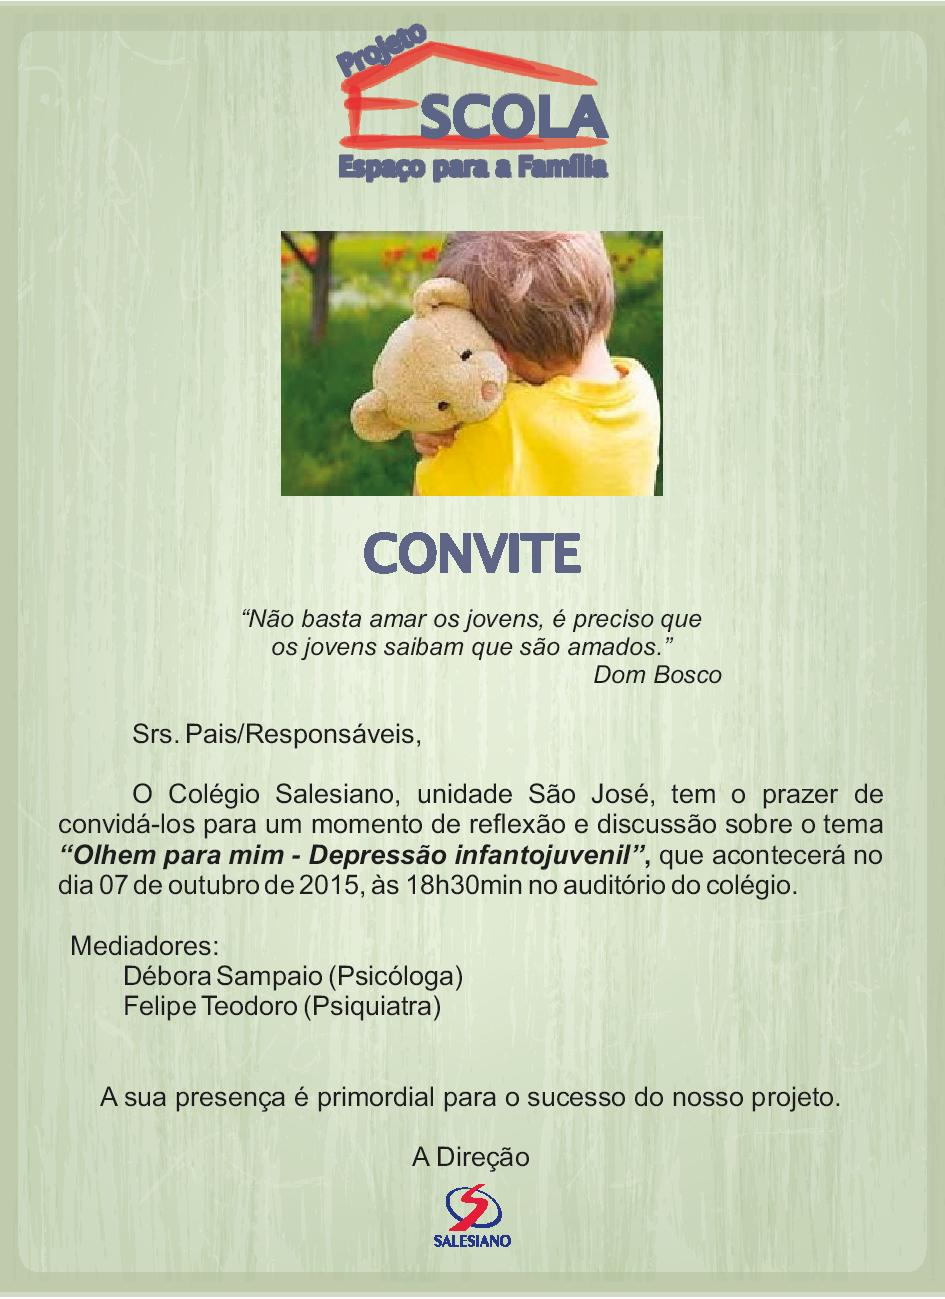 Convite_projeto_escola_espaco_para_a_familia_3a-page-001